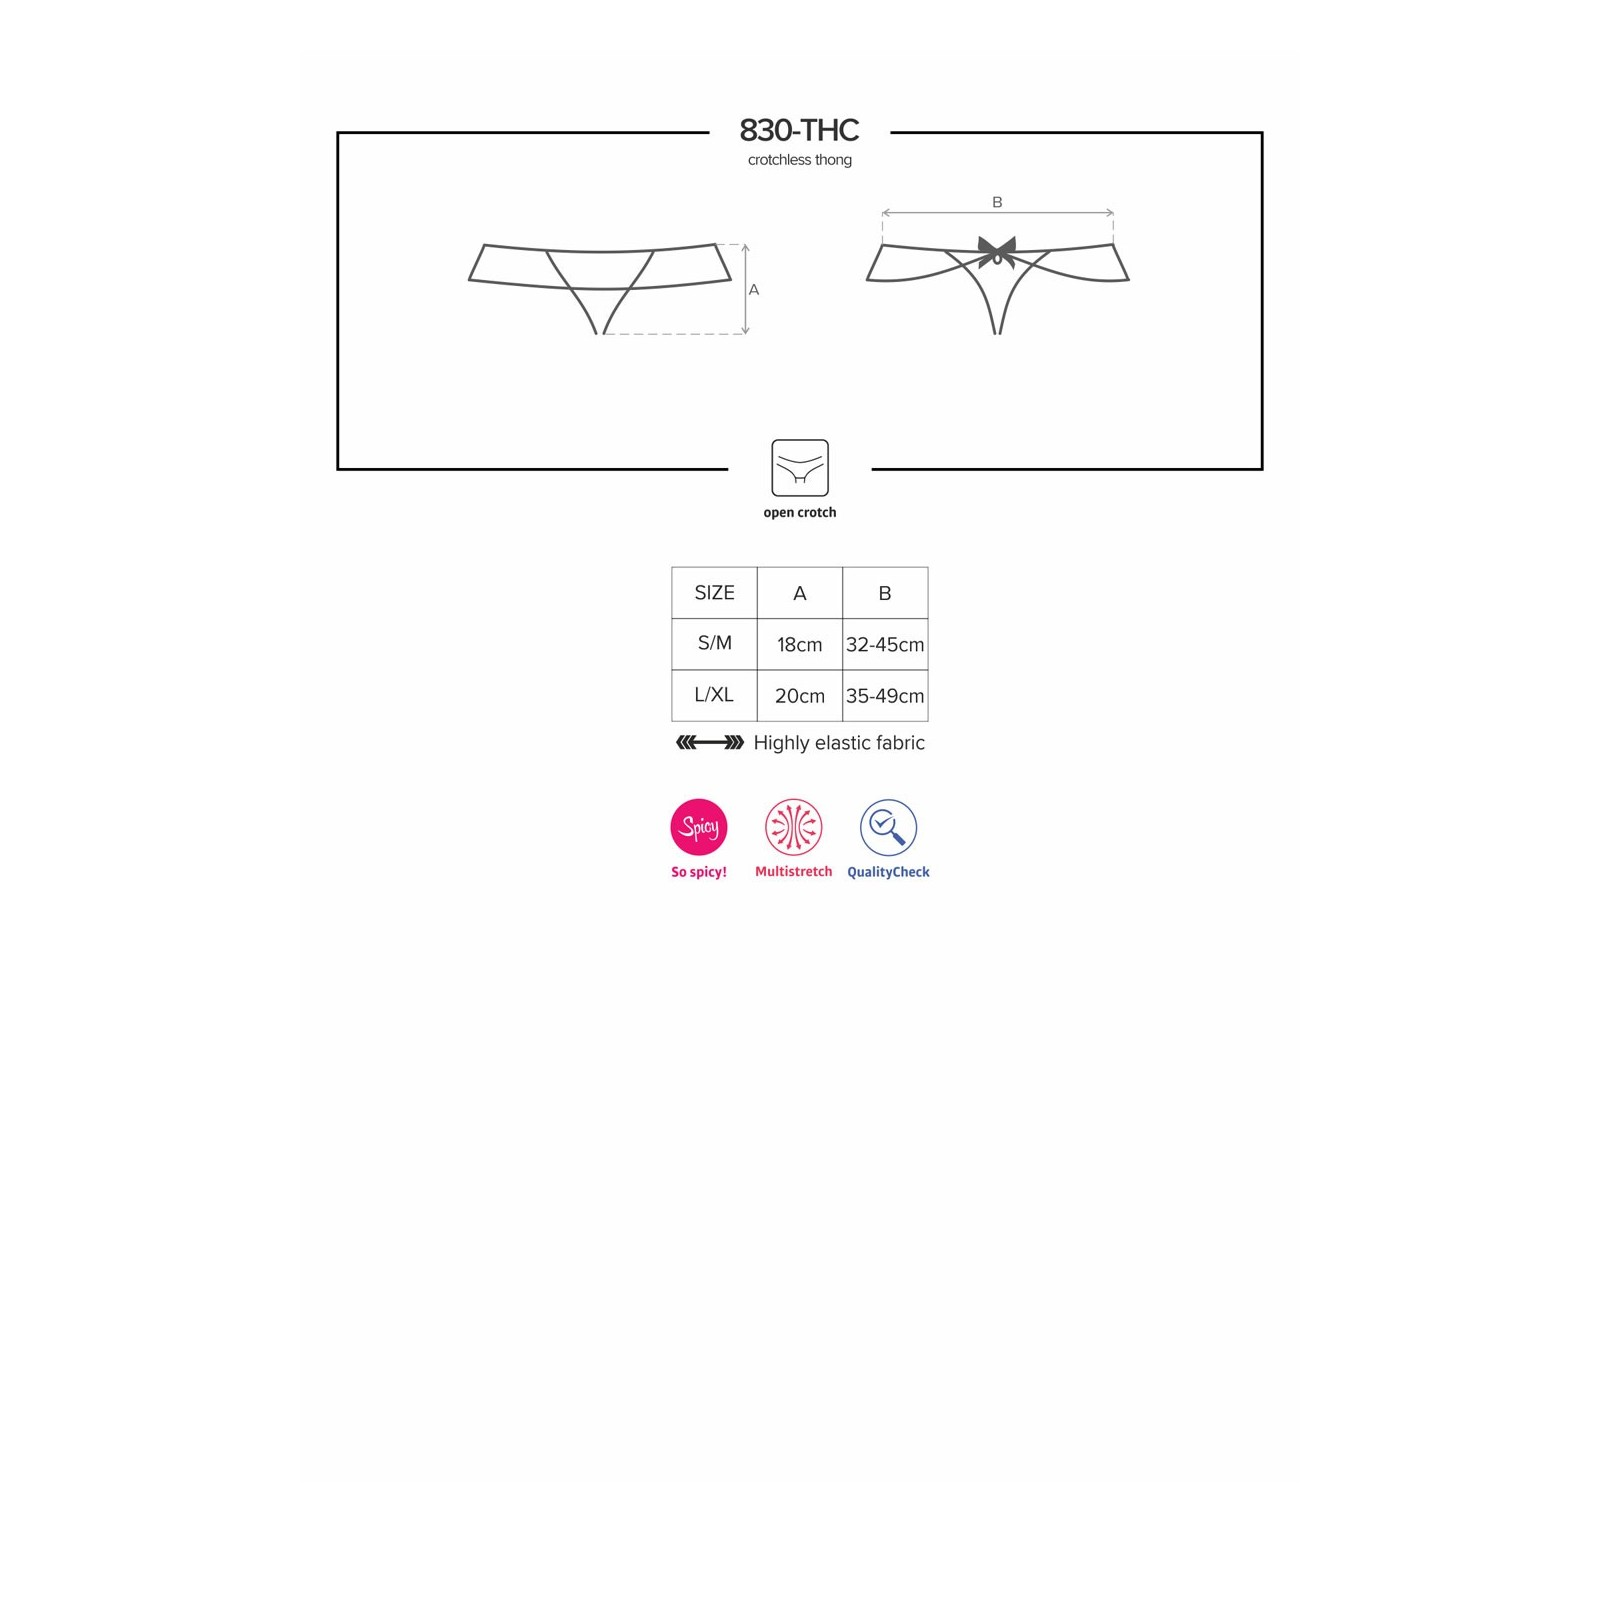 830-THC-1 Crotchless Thong - 9 - Vorschaubild